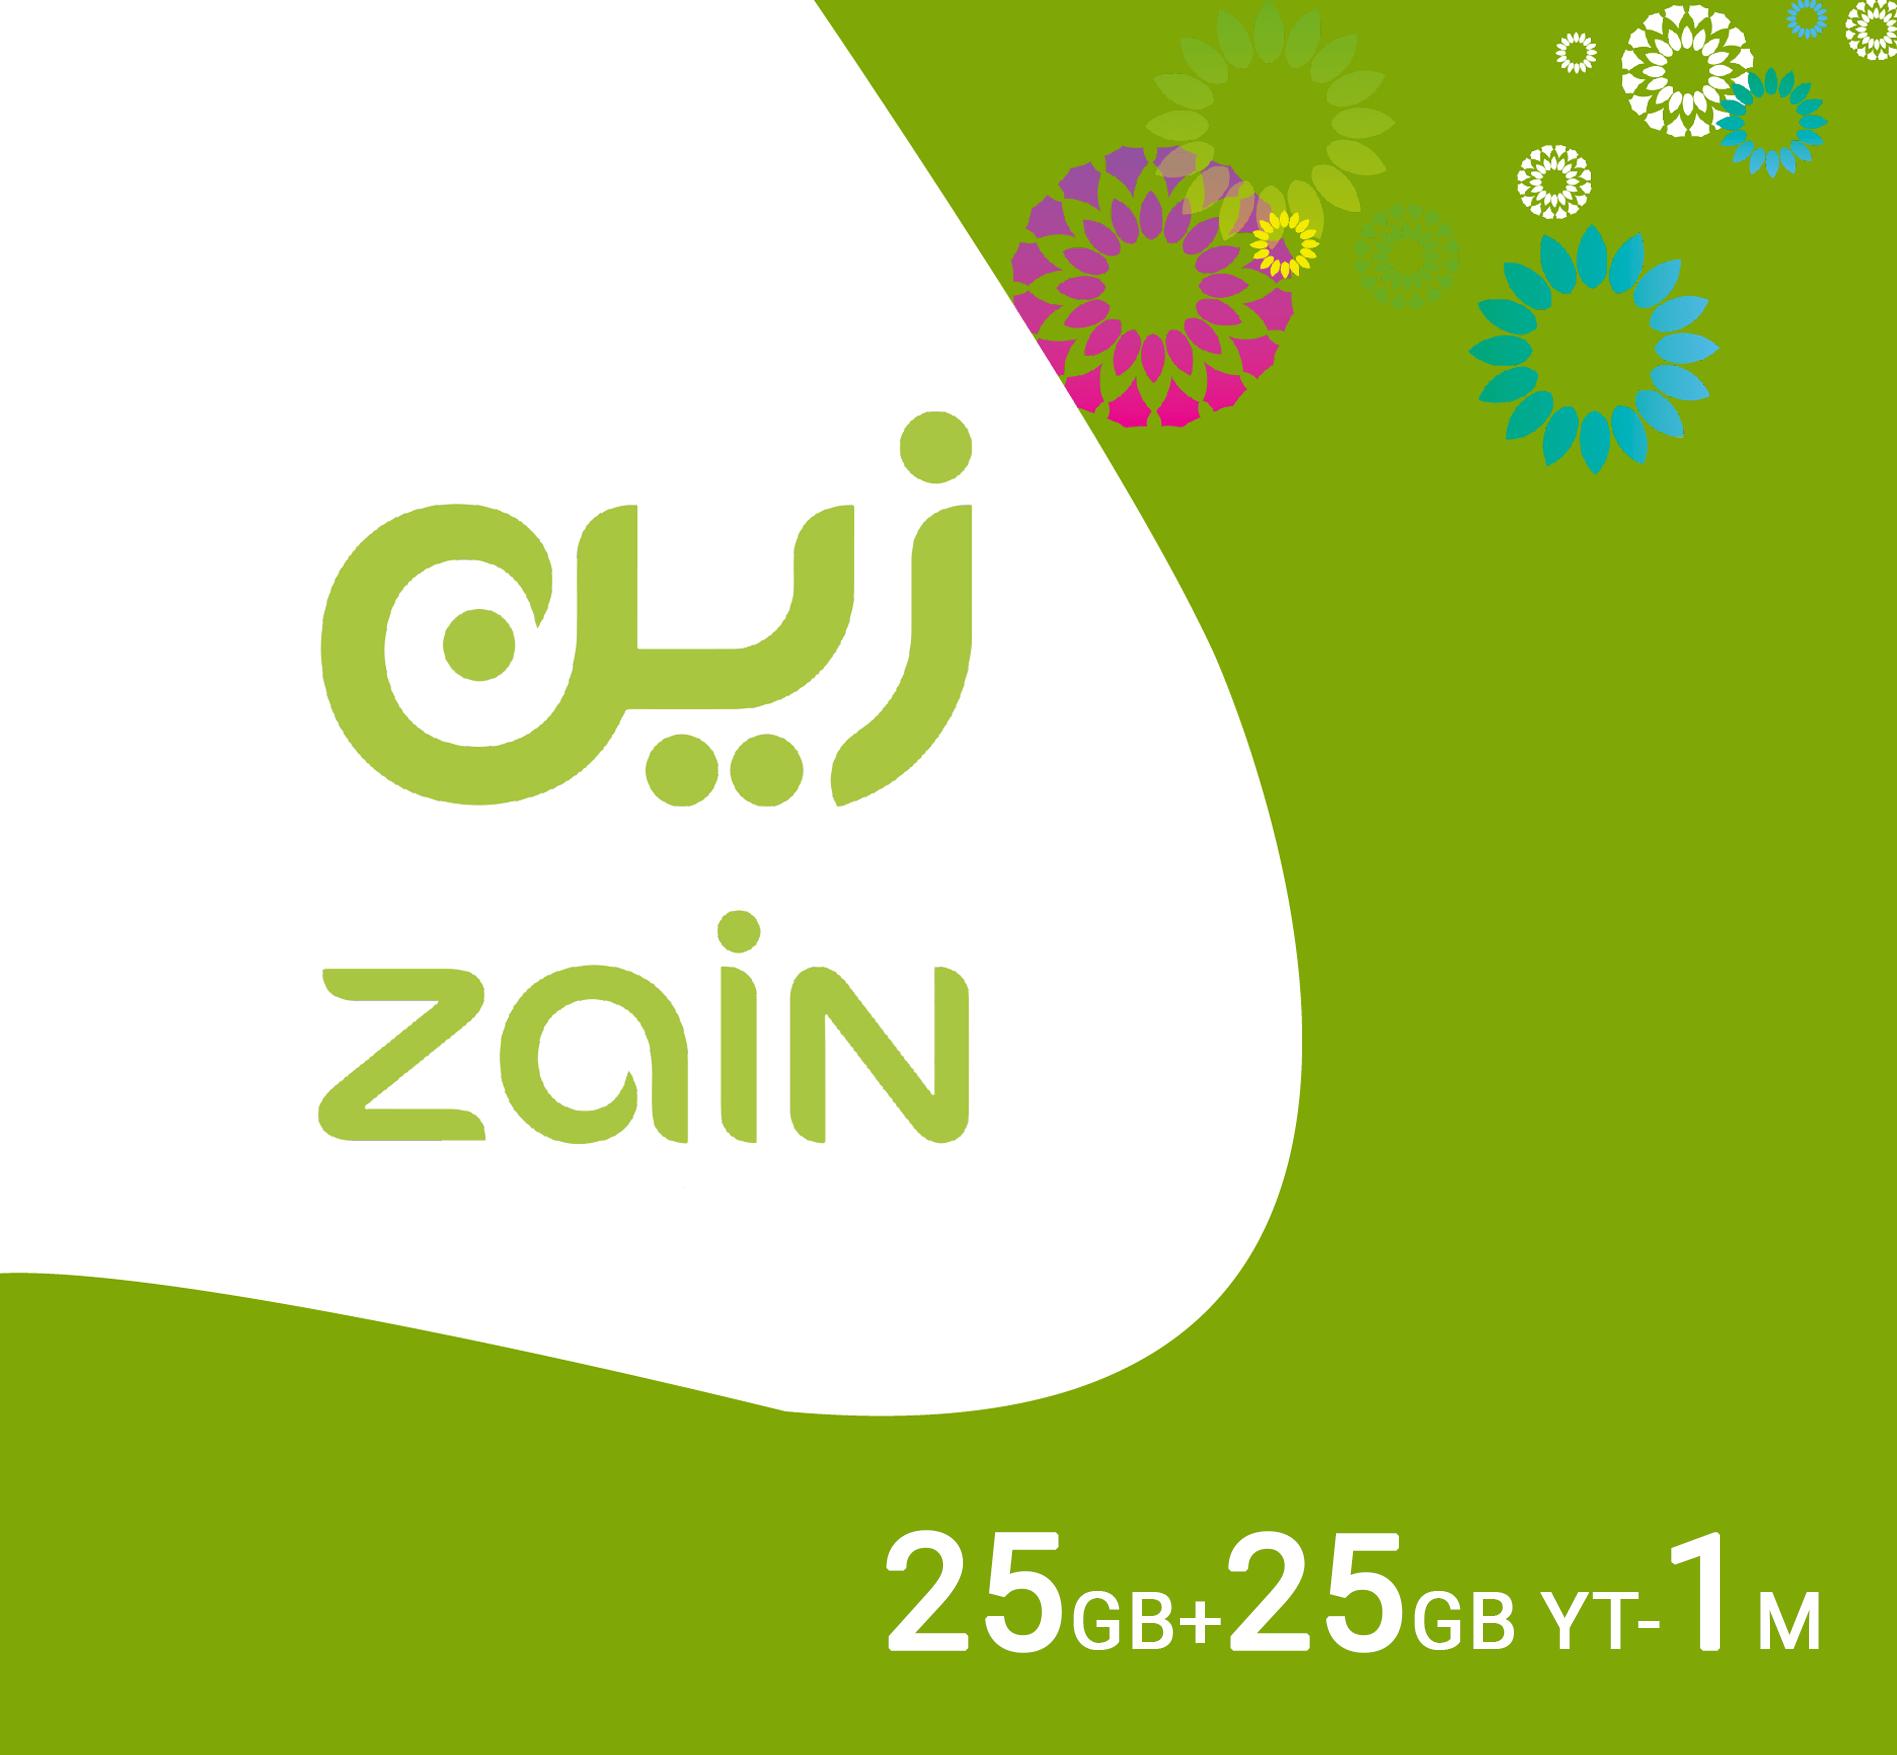 Zain Data Recharge 25GB + 25GB Youtube - 1 Month